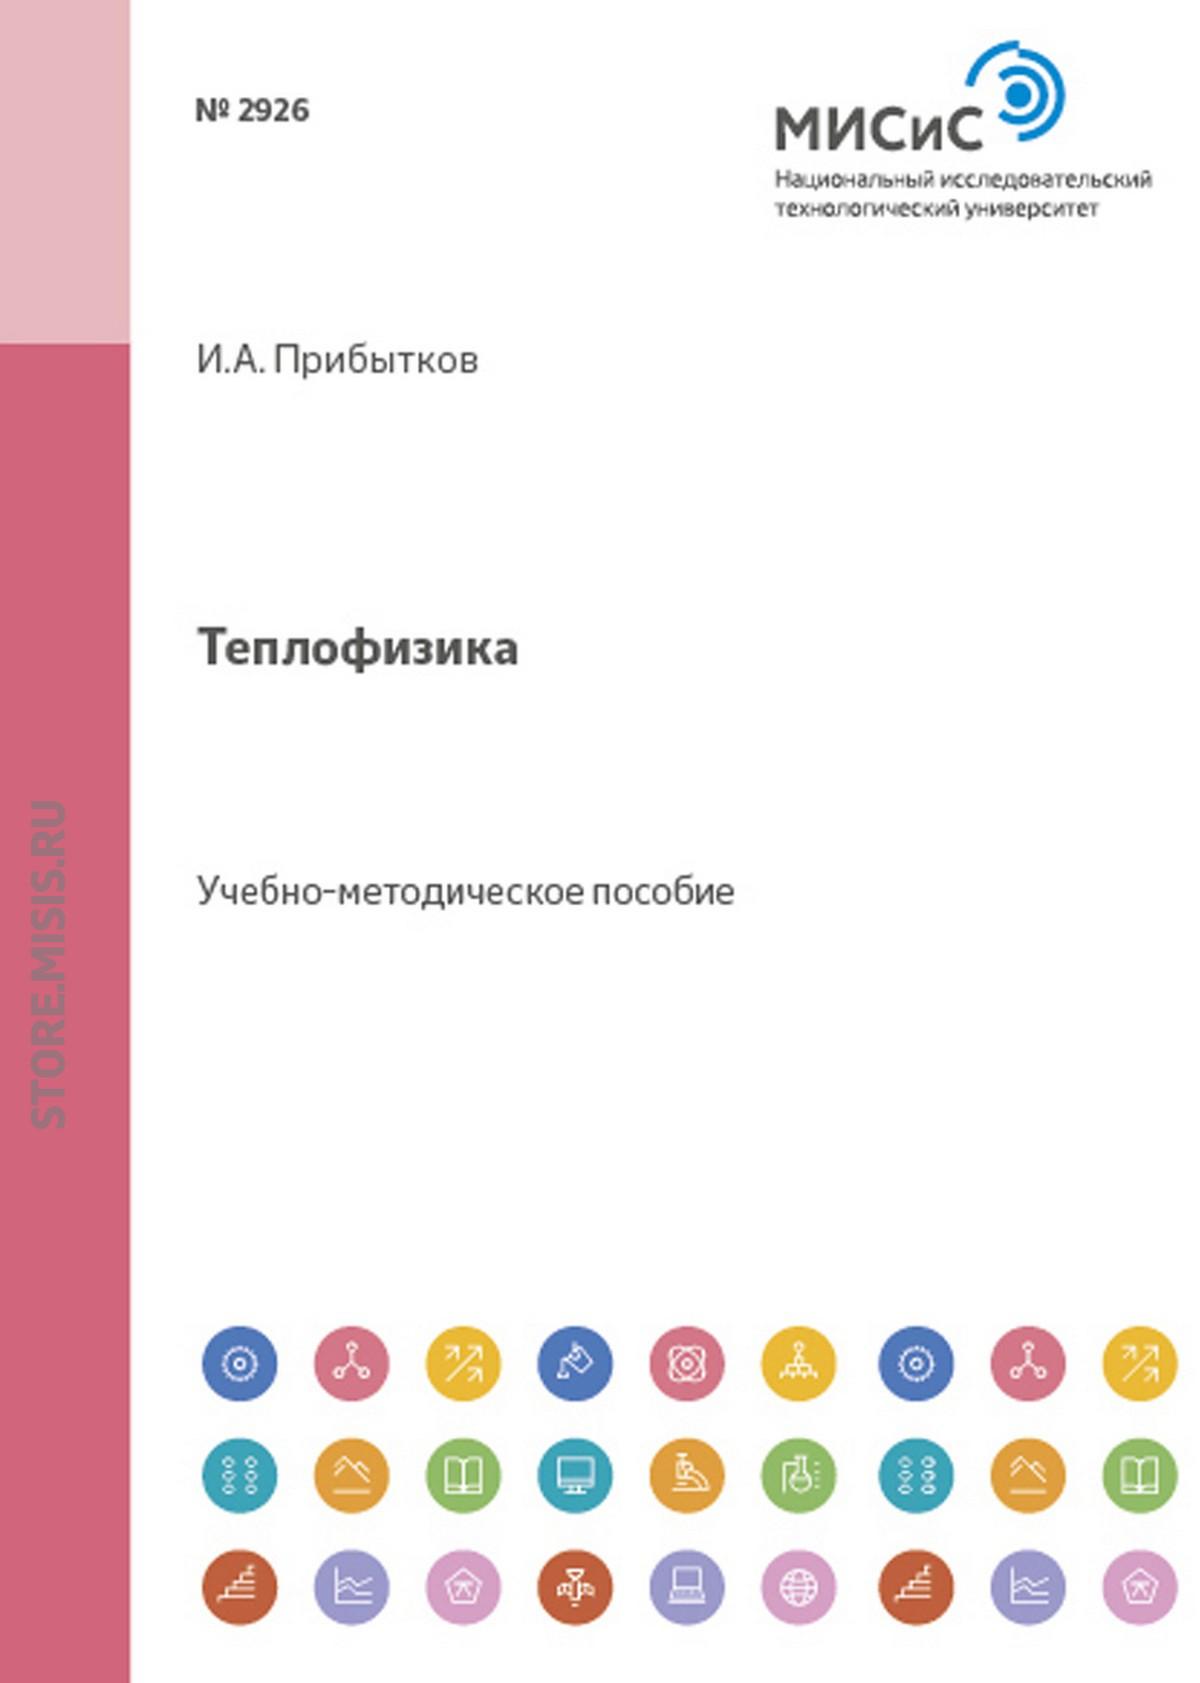 Иван Прибытков Теплофизика алкотестер inspector at100